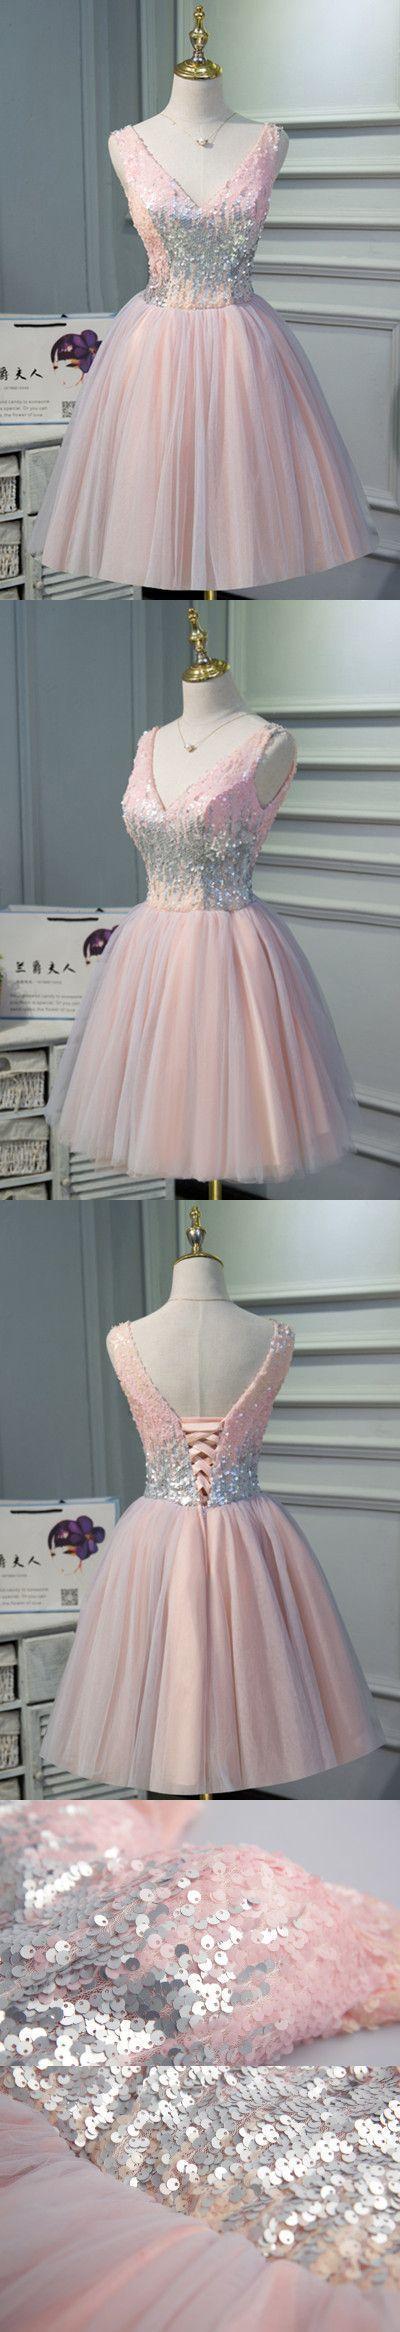 Aline vneck shortmini prom drsess homecoming dress in walk